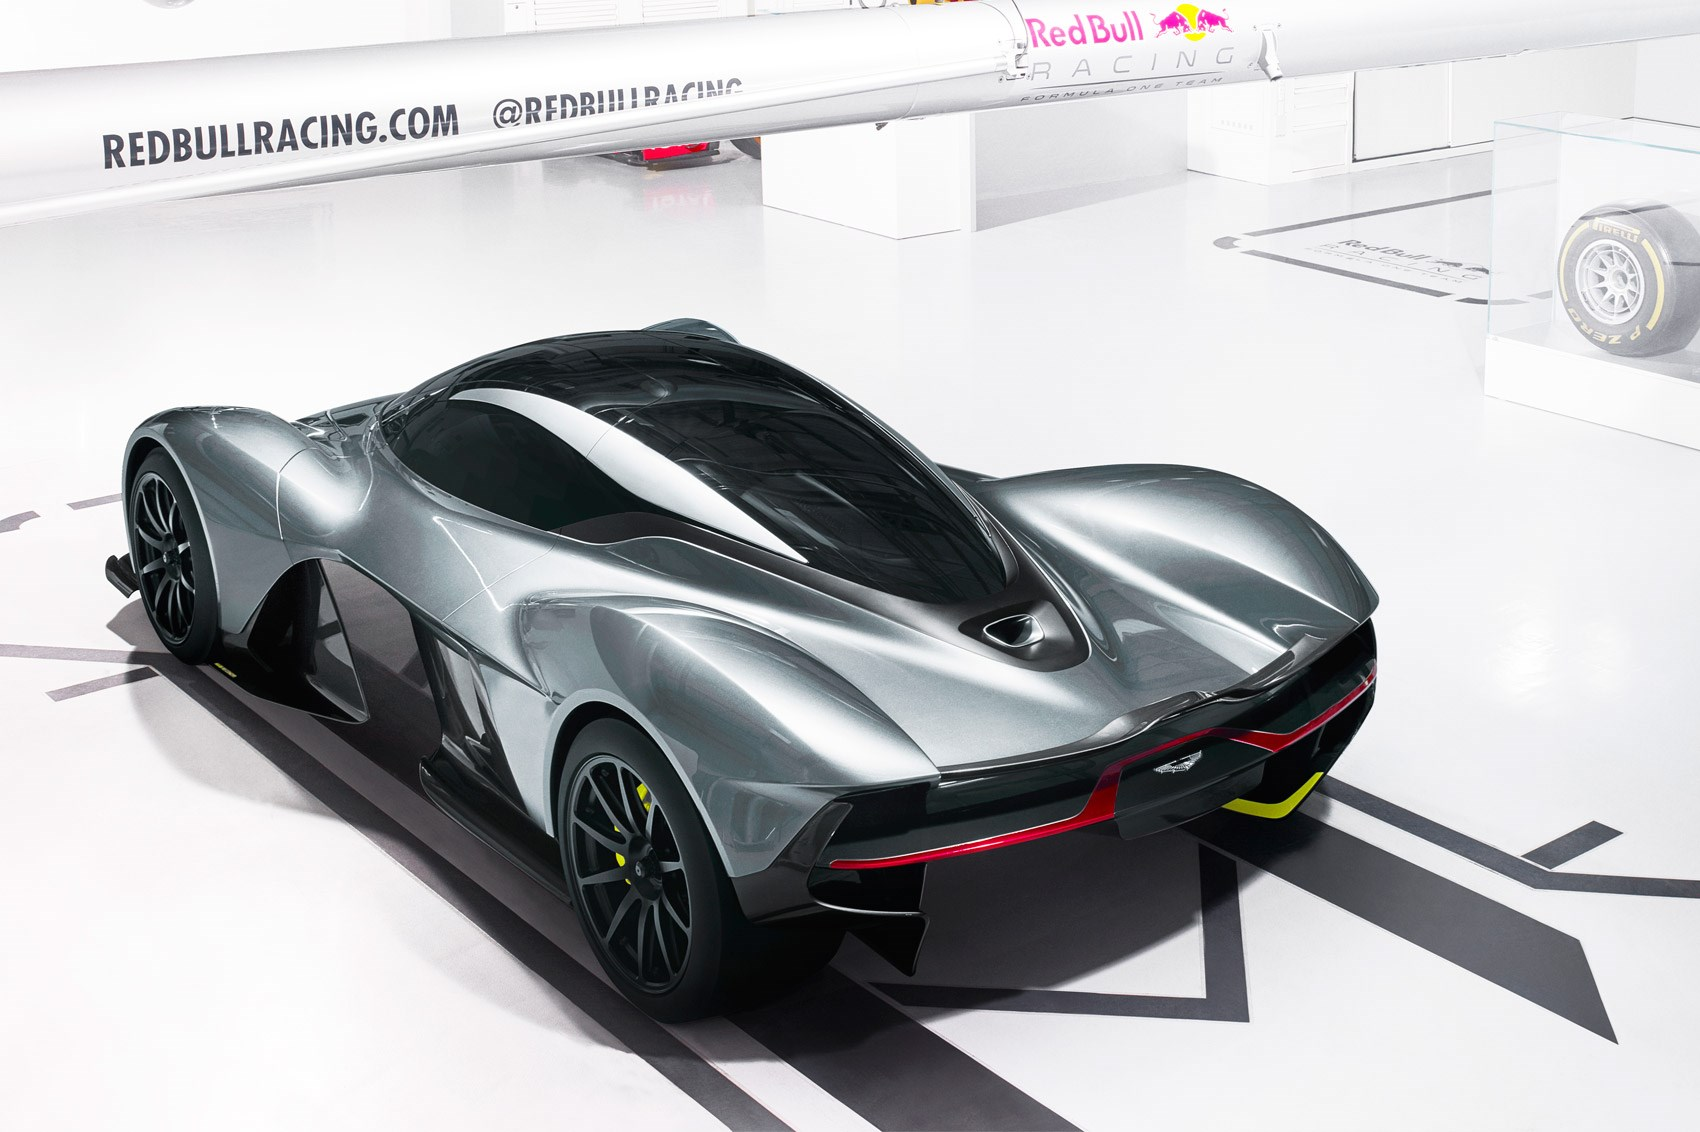 Ride Of The Valkyrie Aston Martin Reveals Hypercar S Tweaked Design